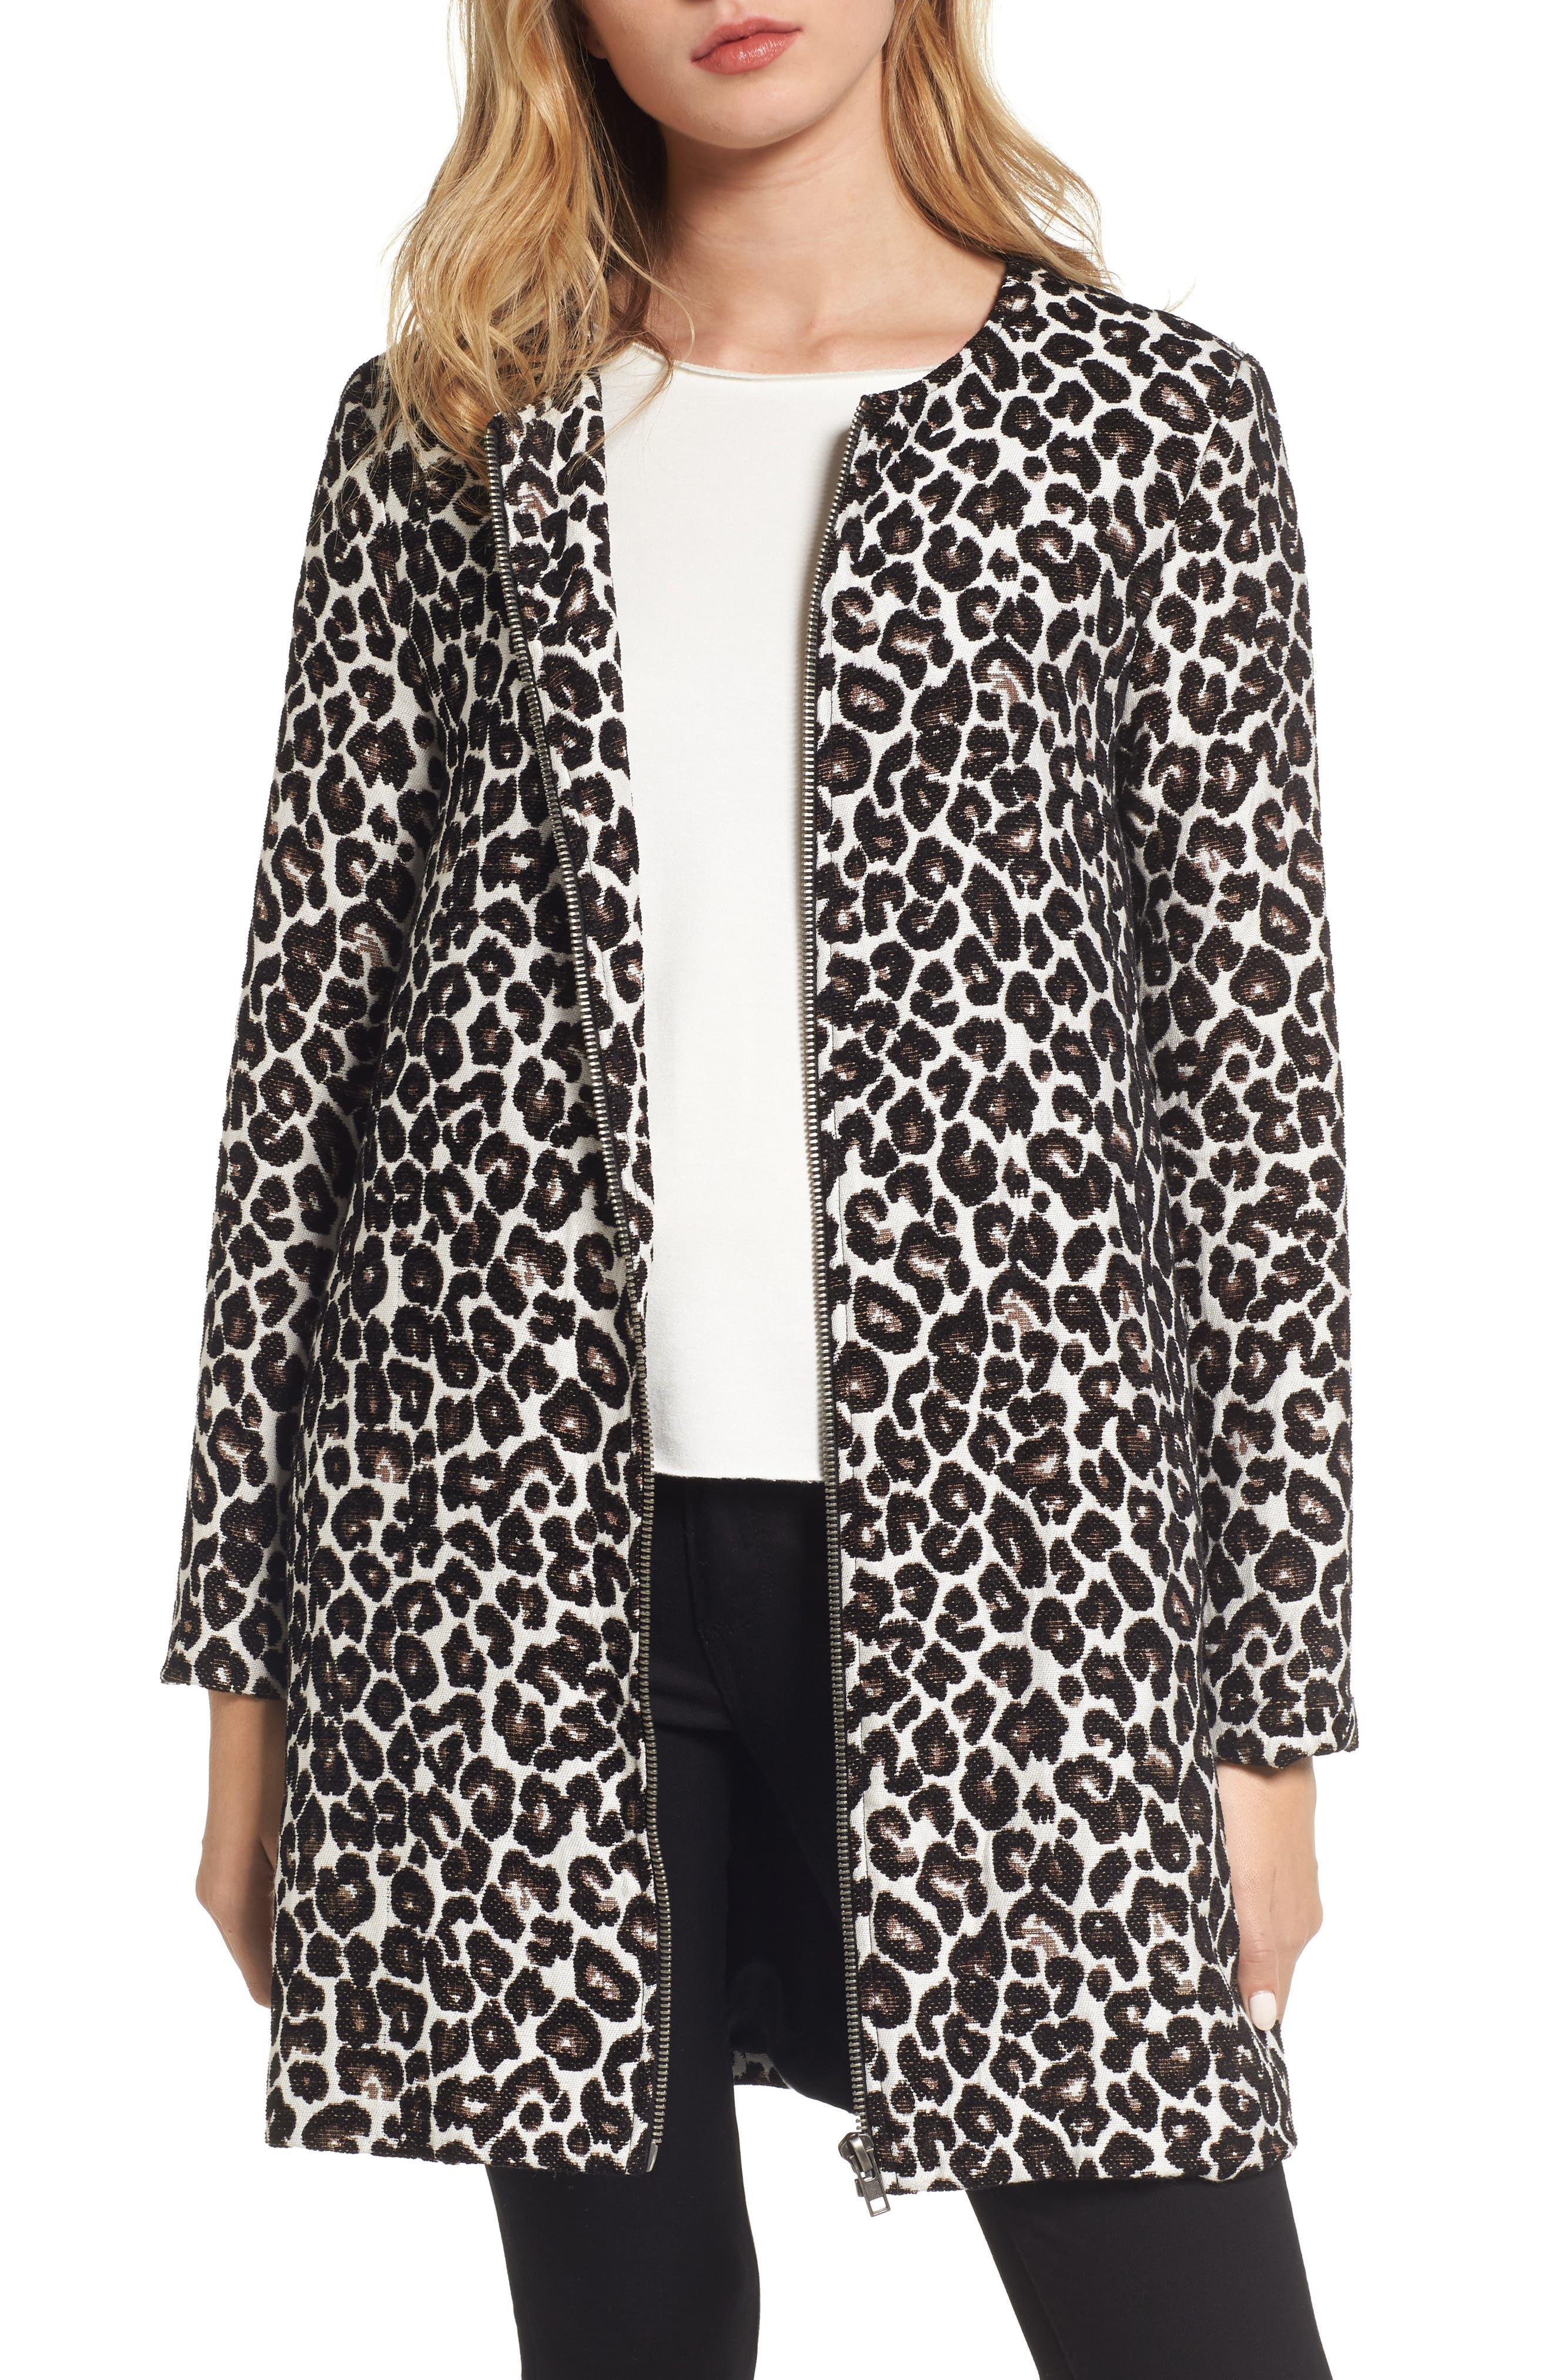 Adeltia Leopard Print Jacket,                         Main,                         color, Leopard